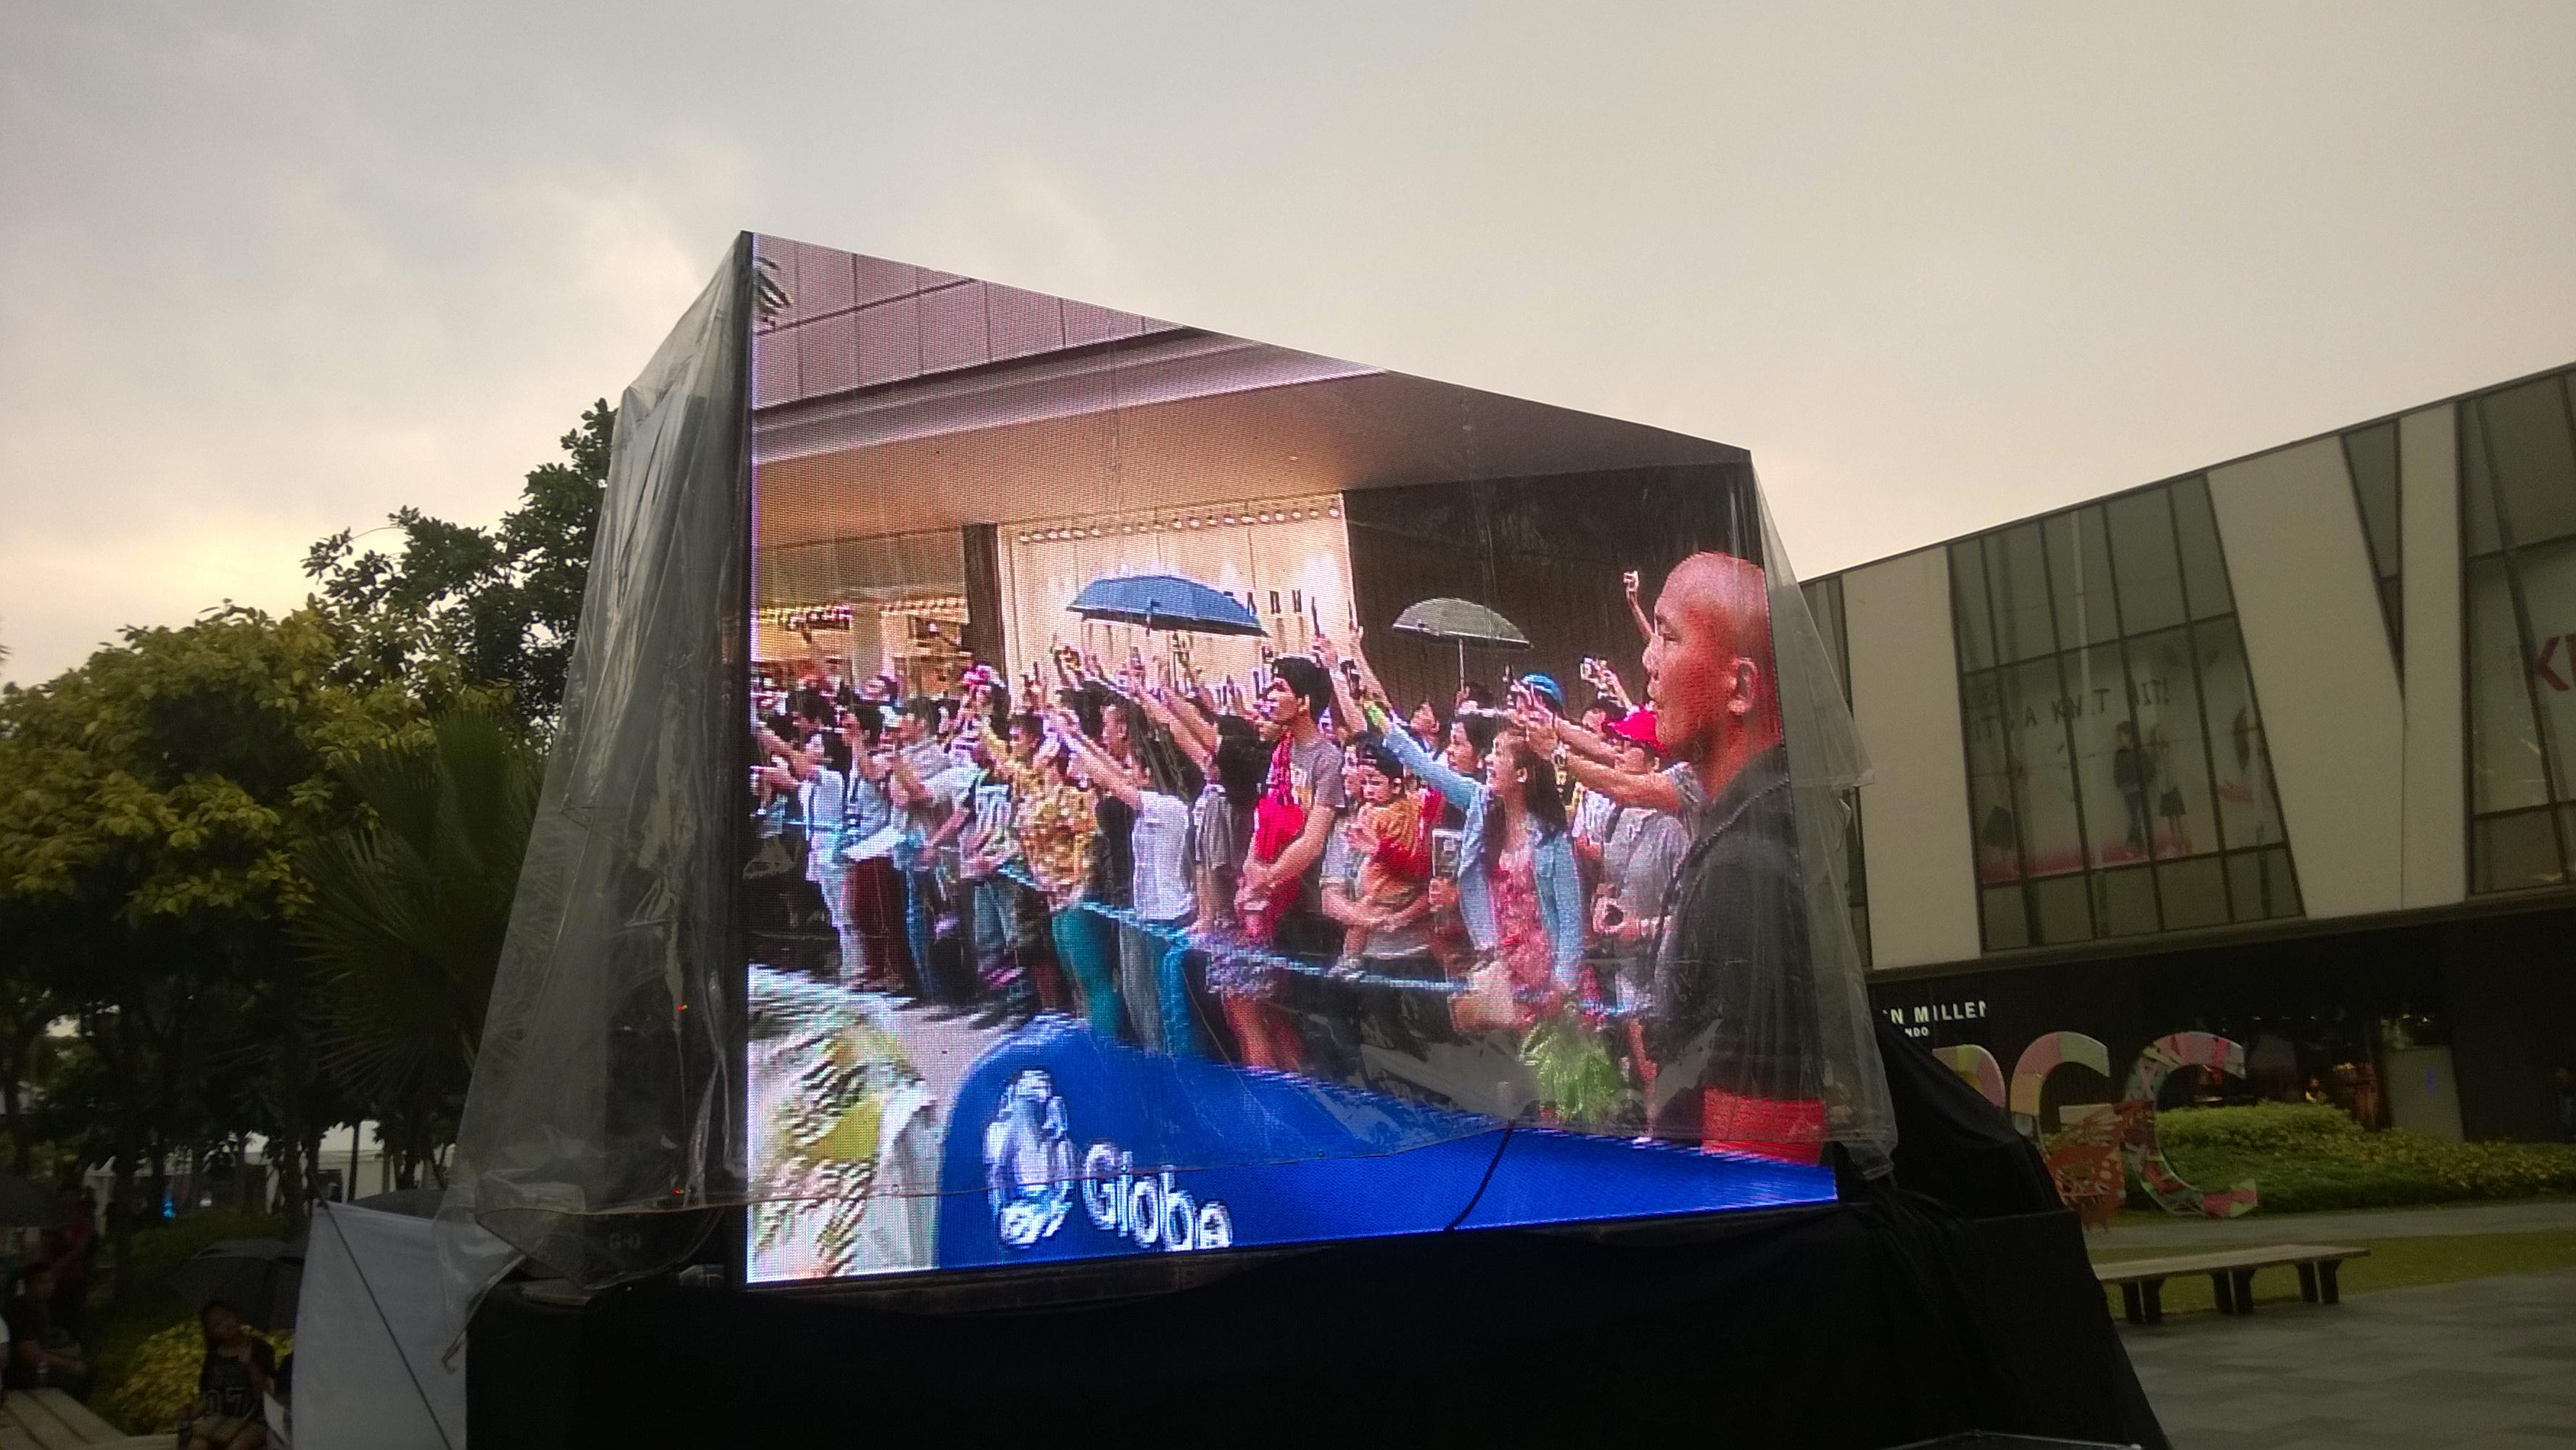 Globe Telecom Slip Stream Marlon Stockinger BGC Taguig Manila Philippines Duane Bacon Bilis Ng Pinoy Mob Crowed Fans